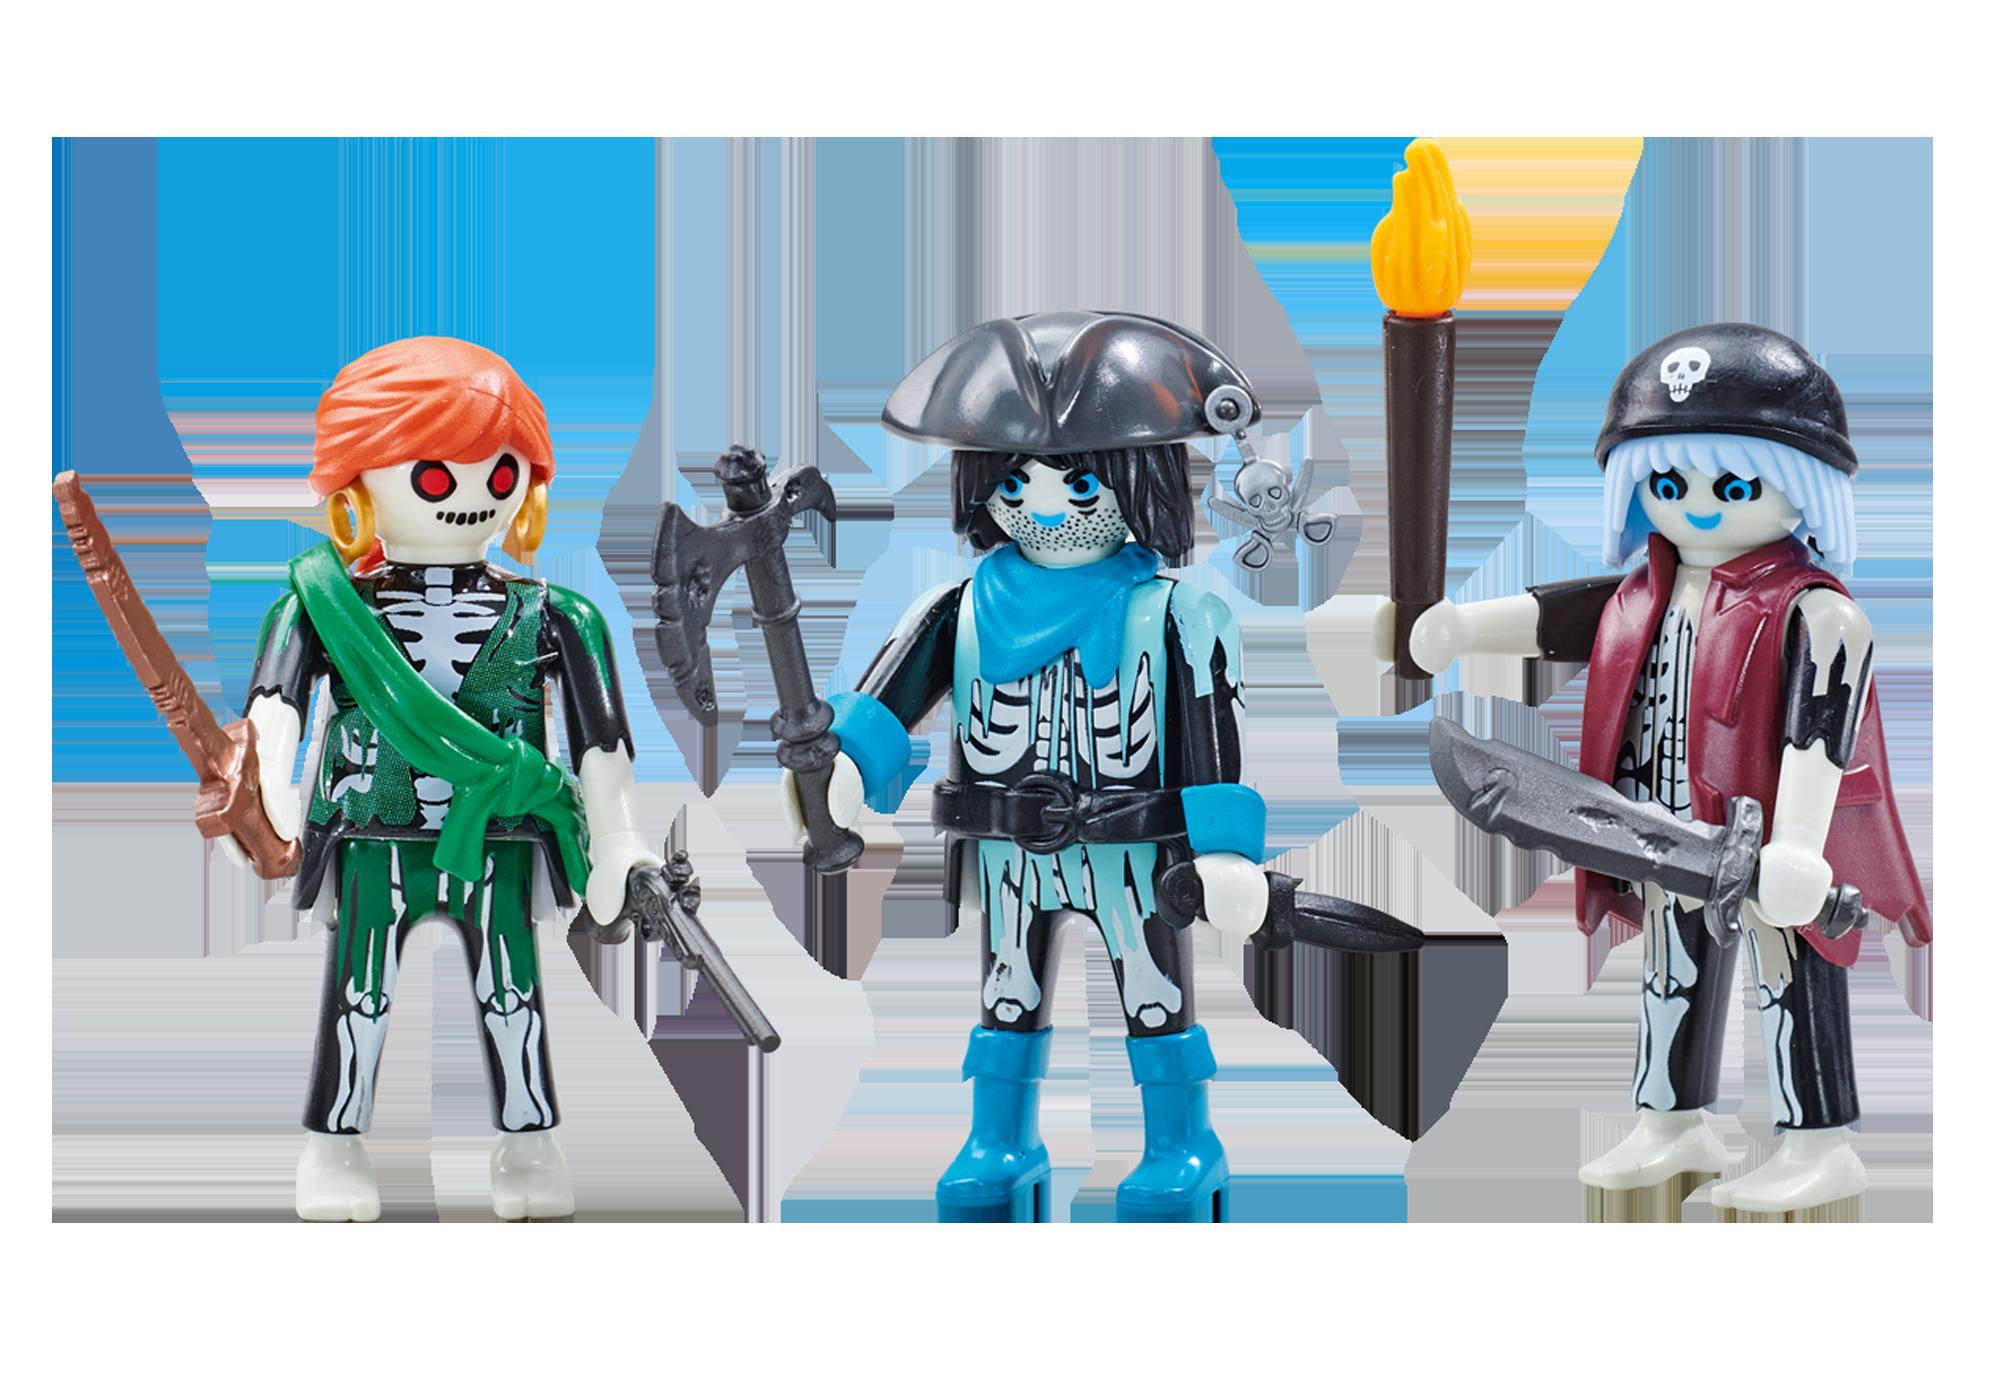 http://media.playmobil.com/i/playmobil/6592_product_detail/Τρεις πειρατές φαντάσματα